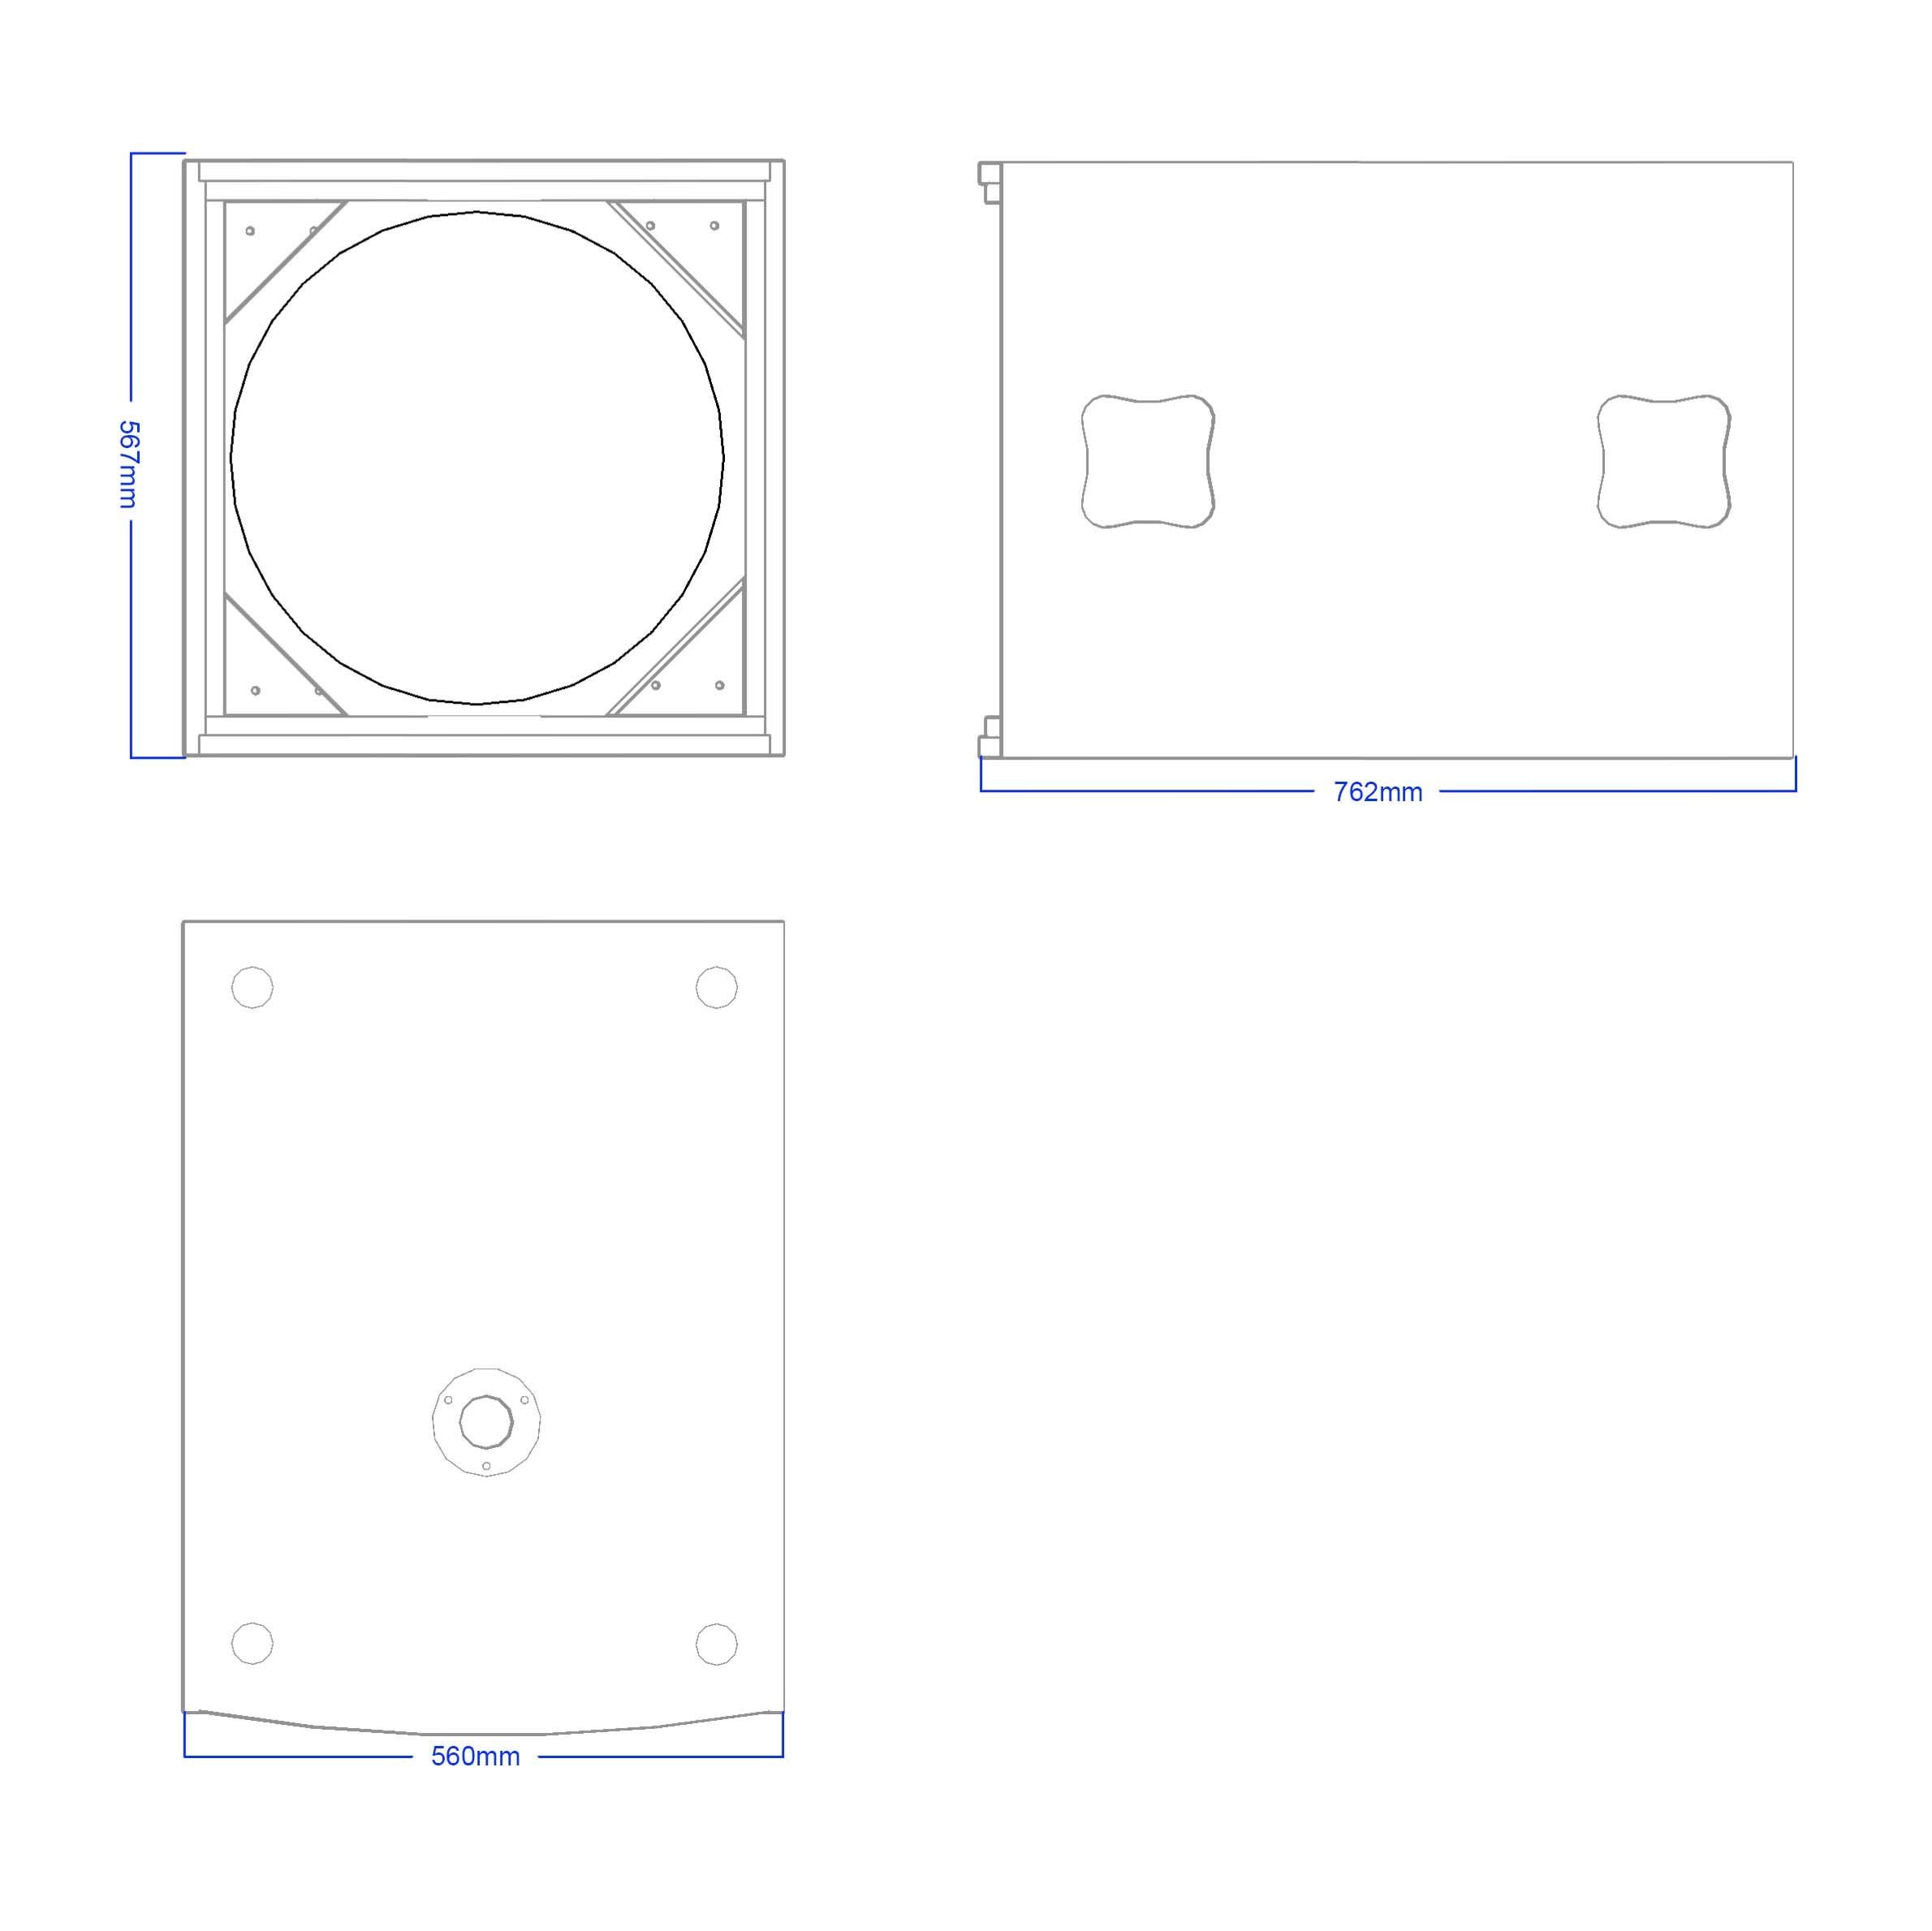 Apt SC 18.1 Sub cabinet - 567, 762, 560mm